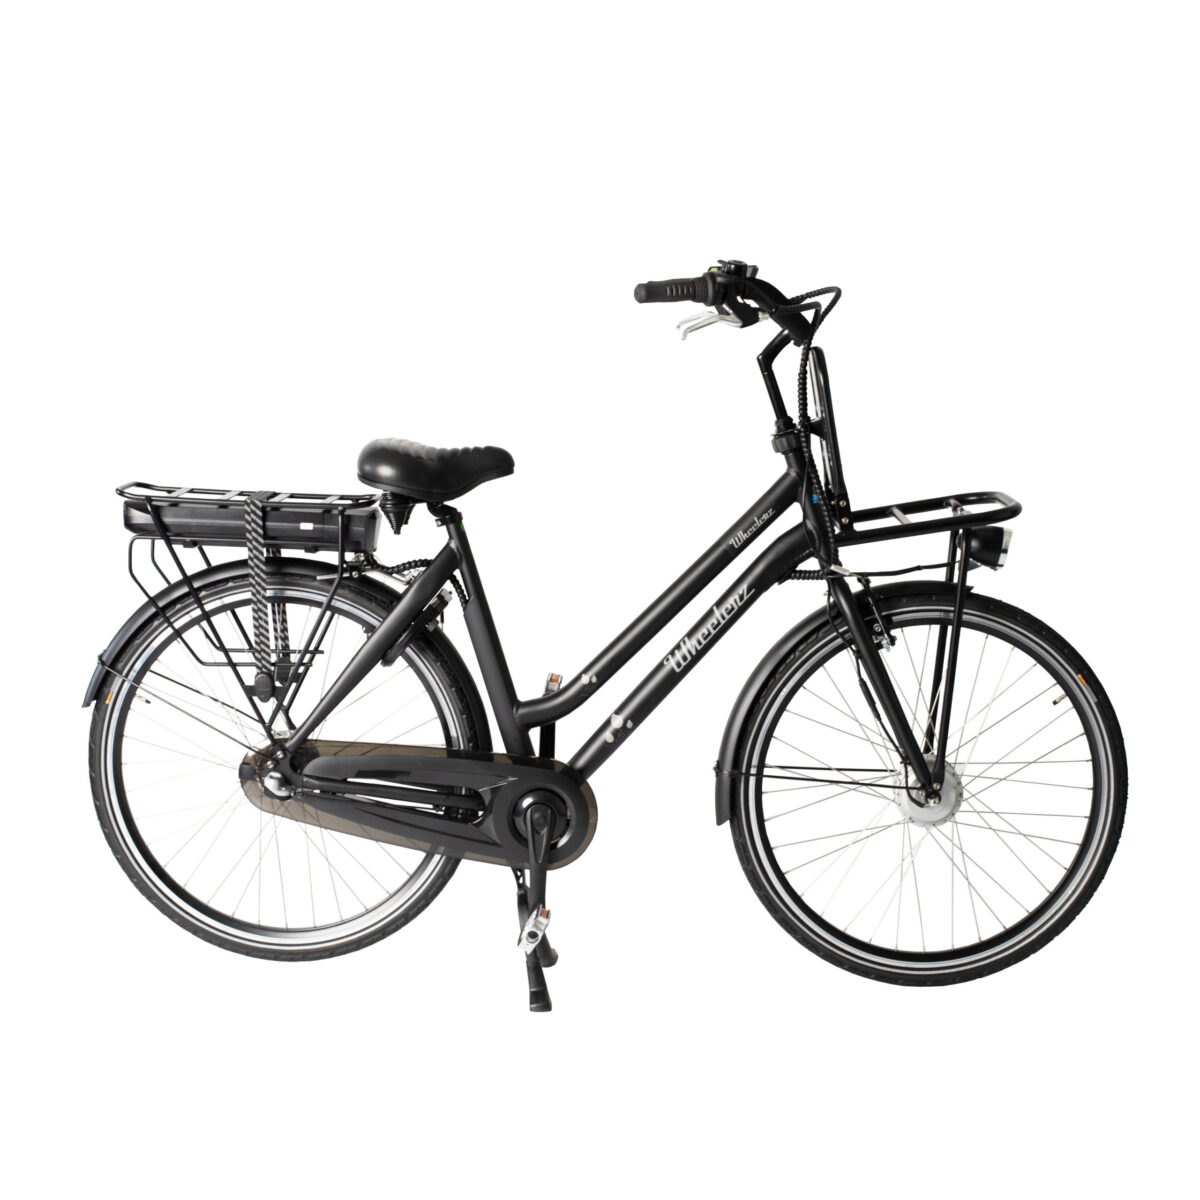 Cargo-e-bike